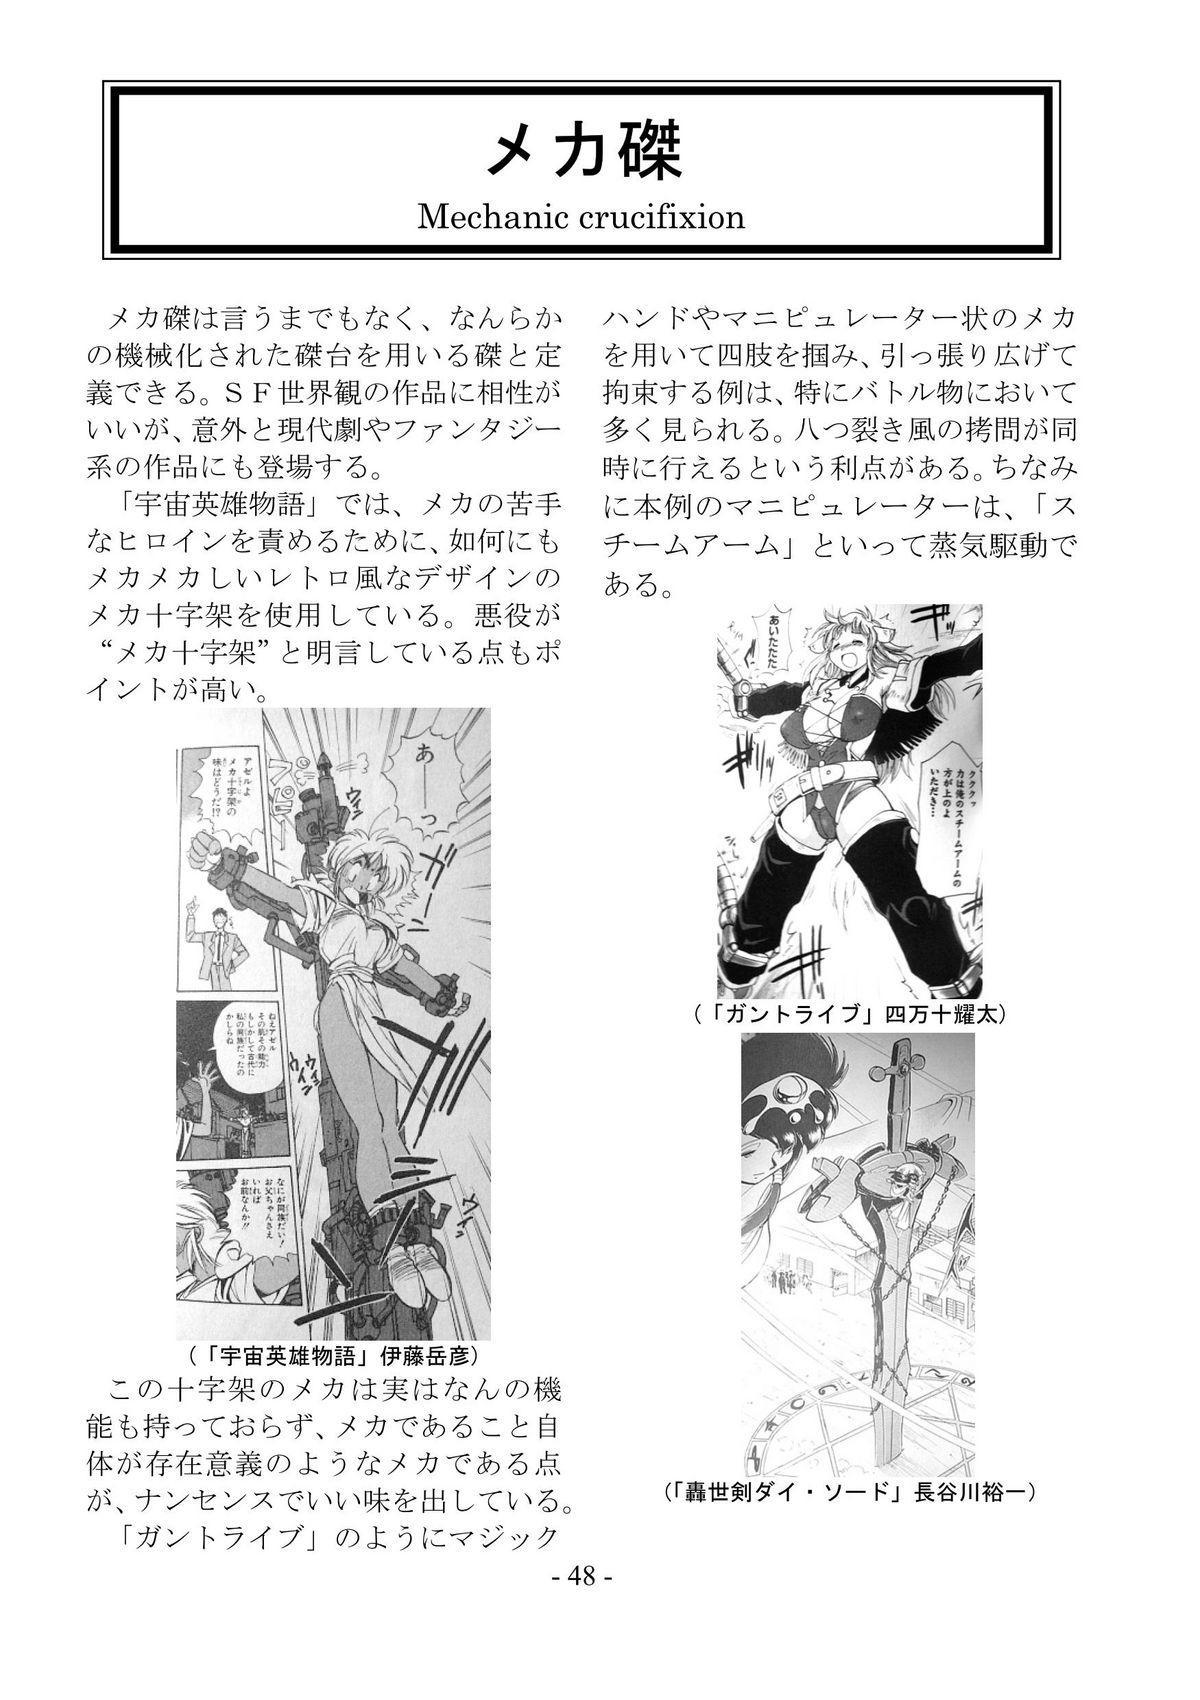 encyclopedia of crucifixion 48